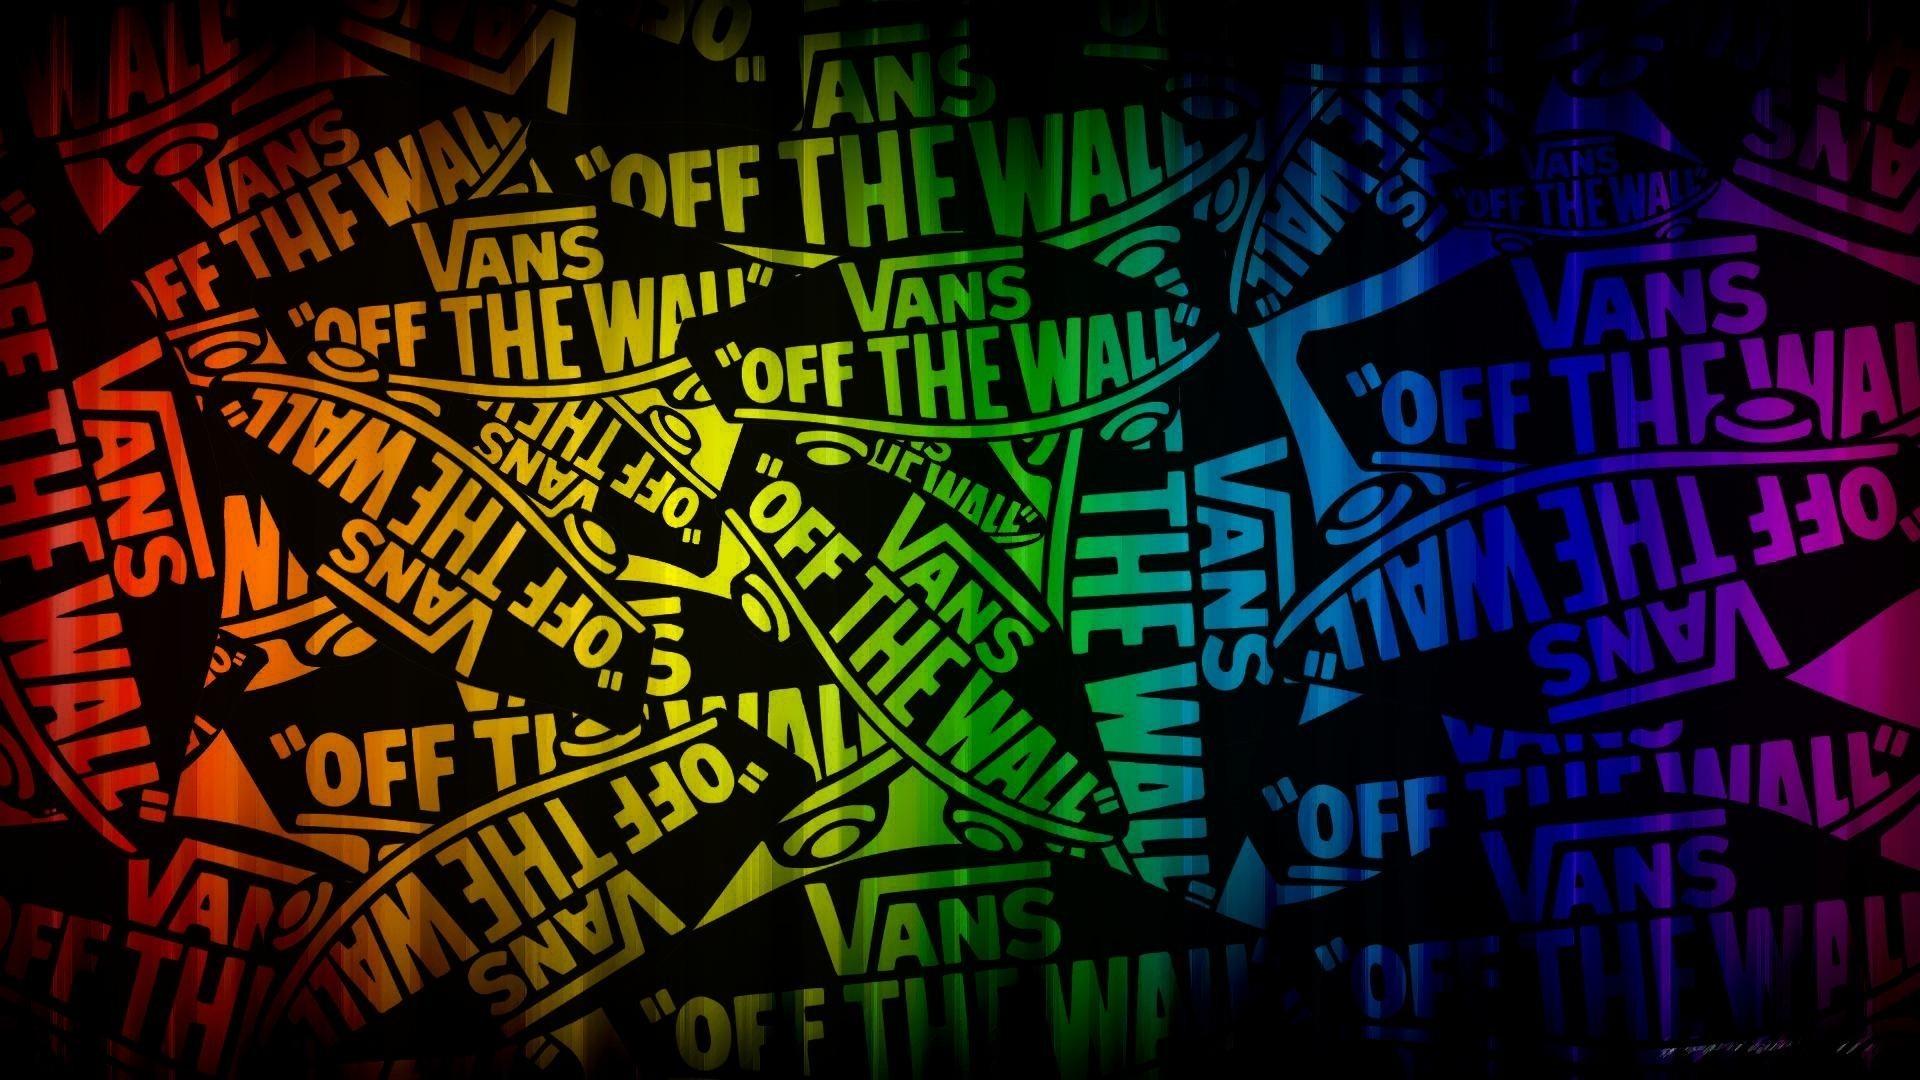 Res: 1920x1080, Spitfire Logo Wallpaper Spitfire Wheels Logo Wallpaper 610x510 Source ·  Primitive Skate Wallpaper HD